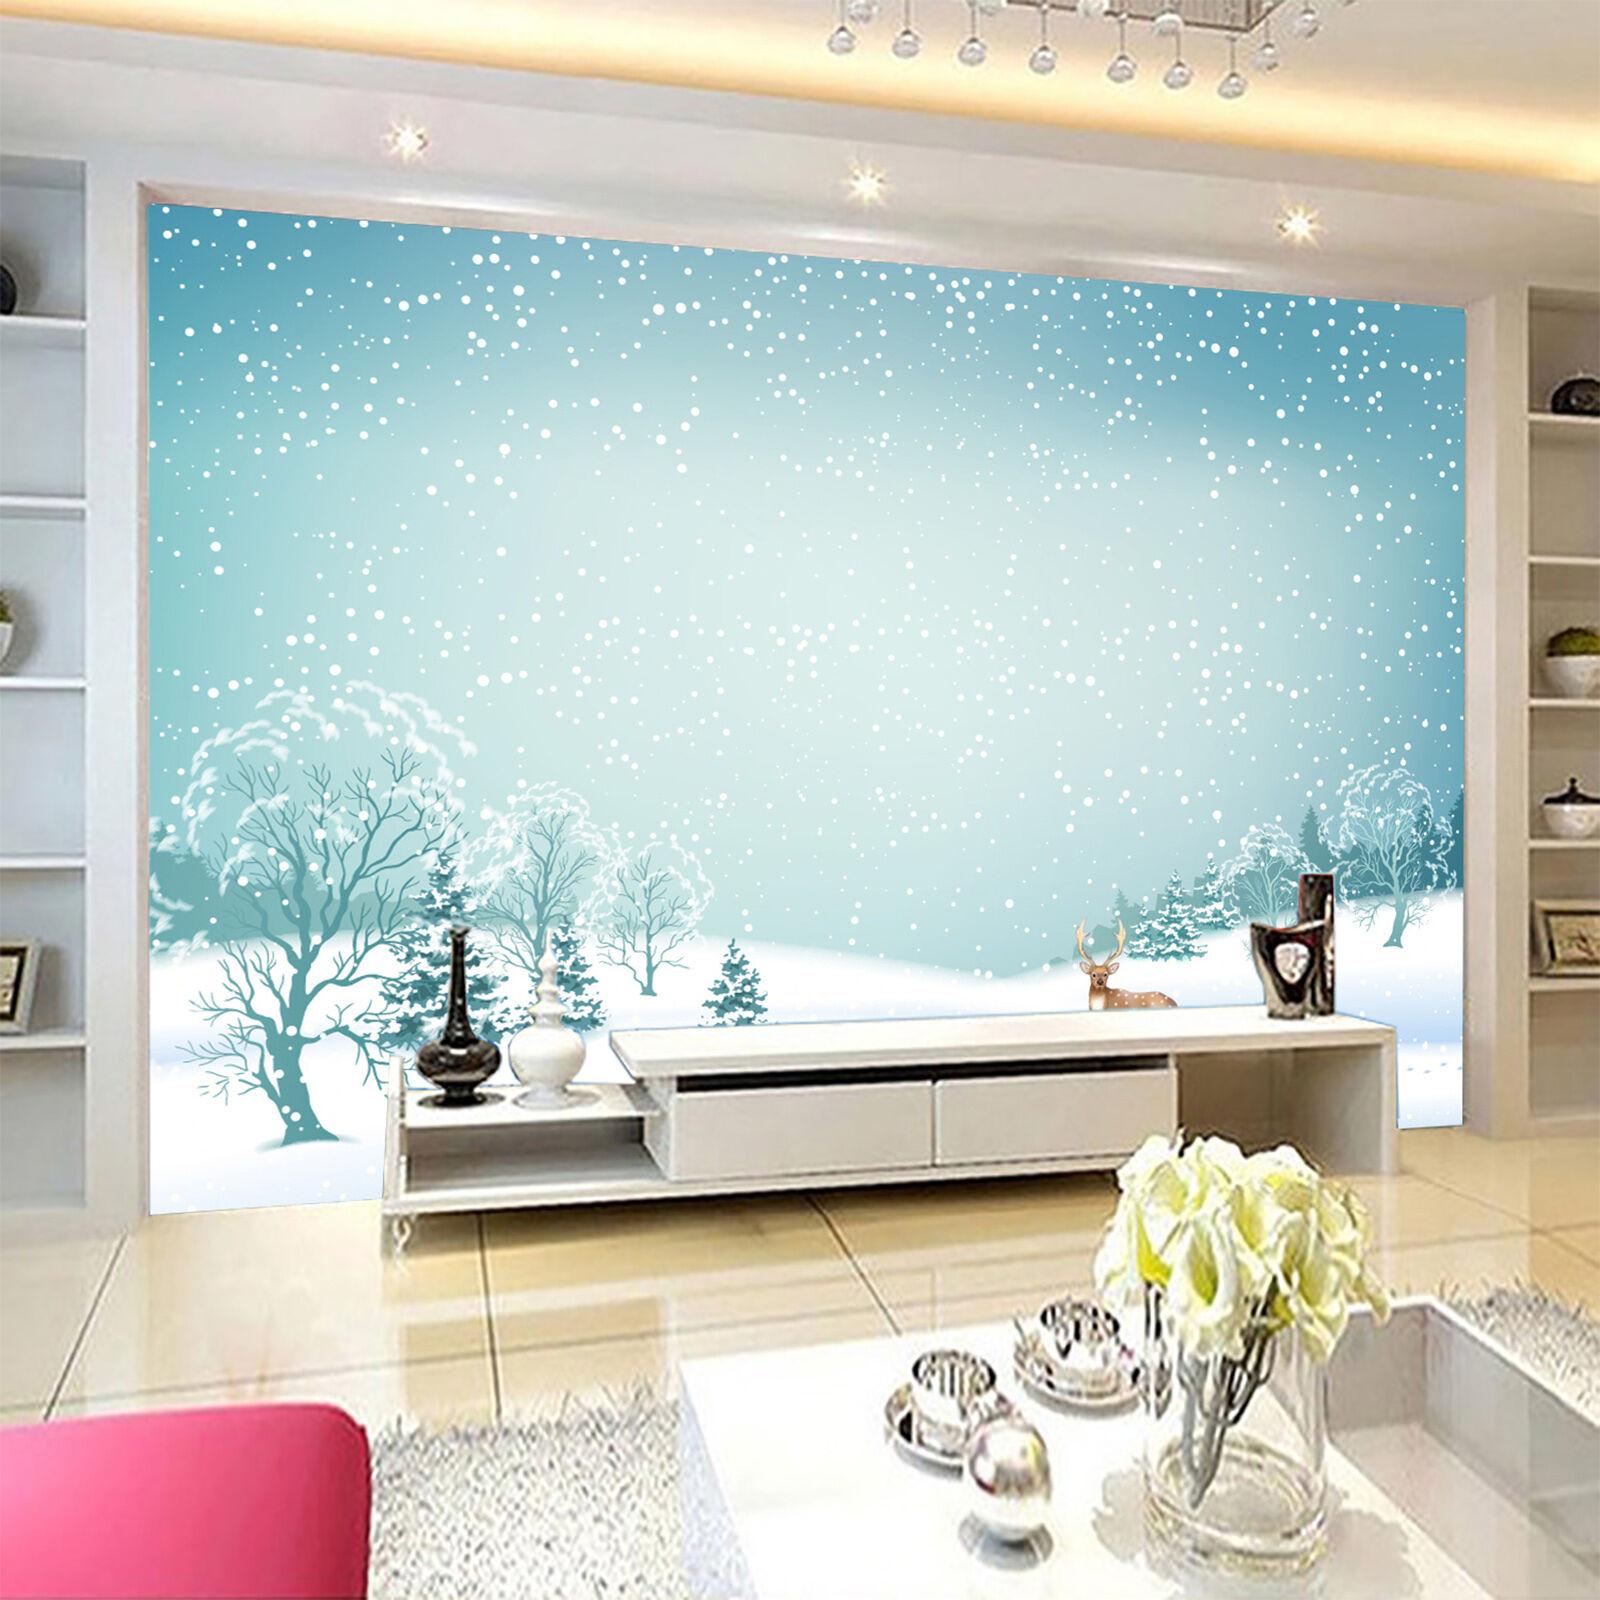 3D Snowing Cartoon deer Wall Paper Print Decal Wall Deco Indoor wall Mural